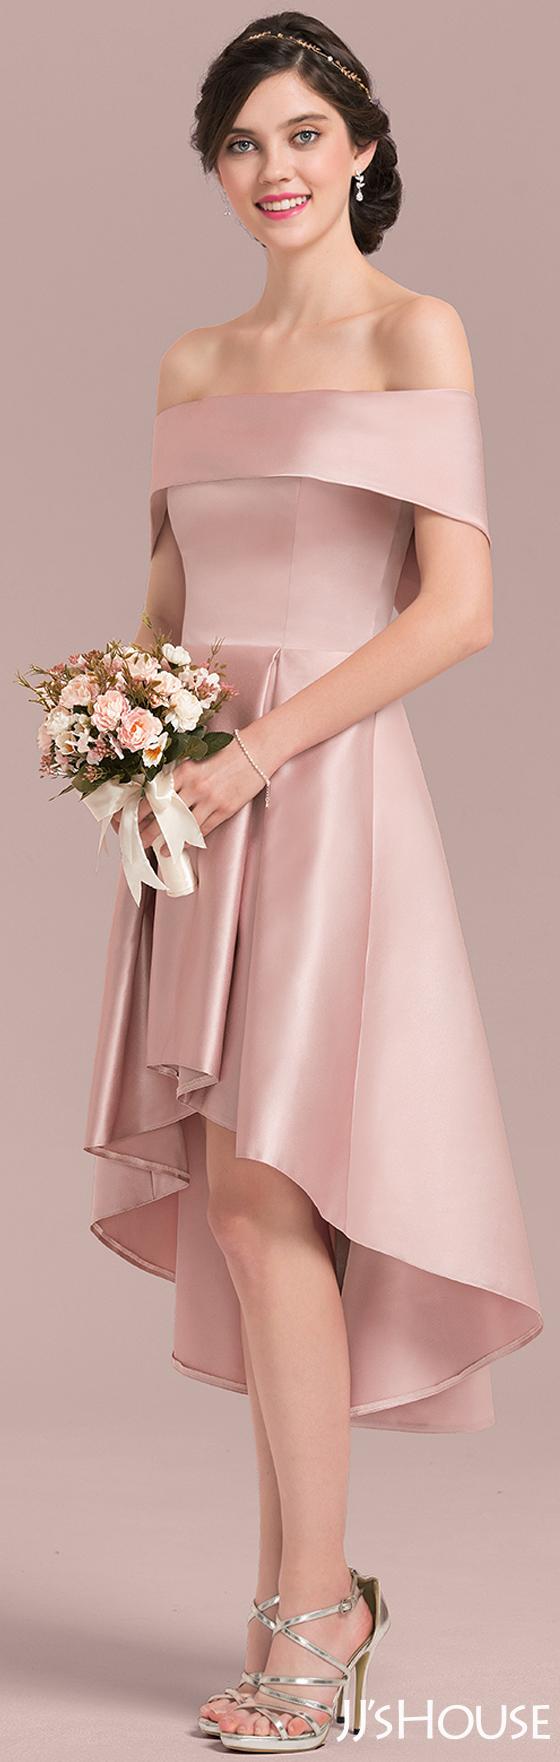 Moderno Pinterest Vestidos De Dama Componente - Colección de ...